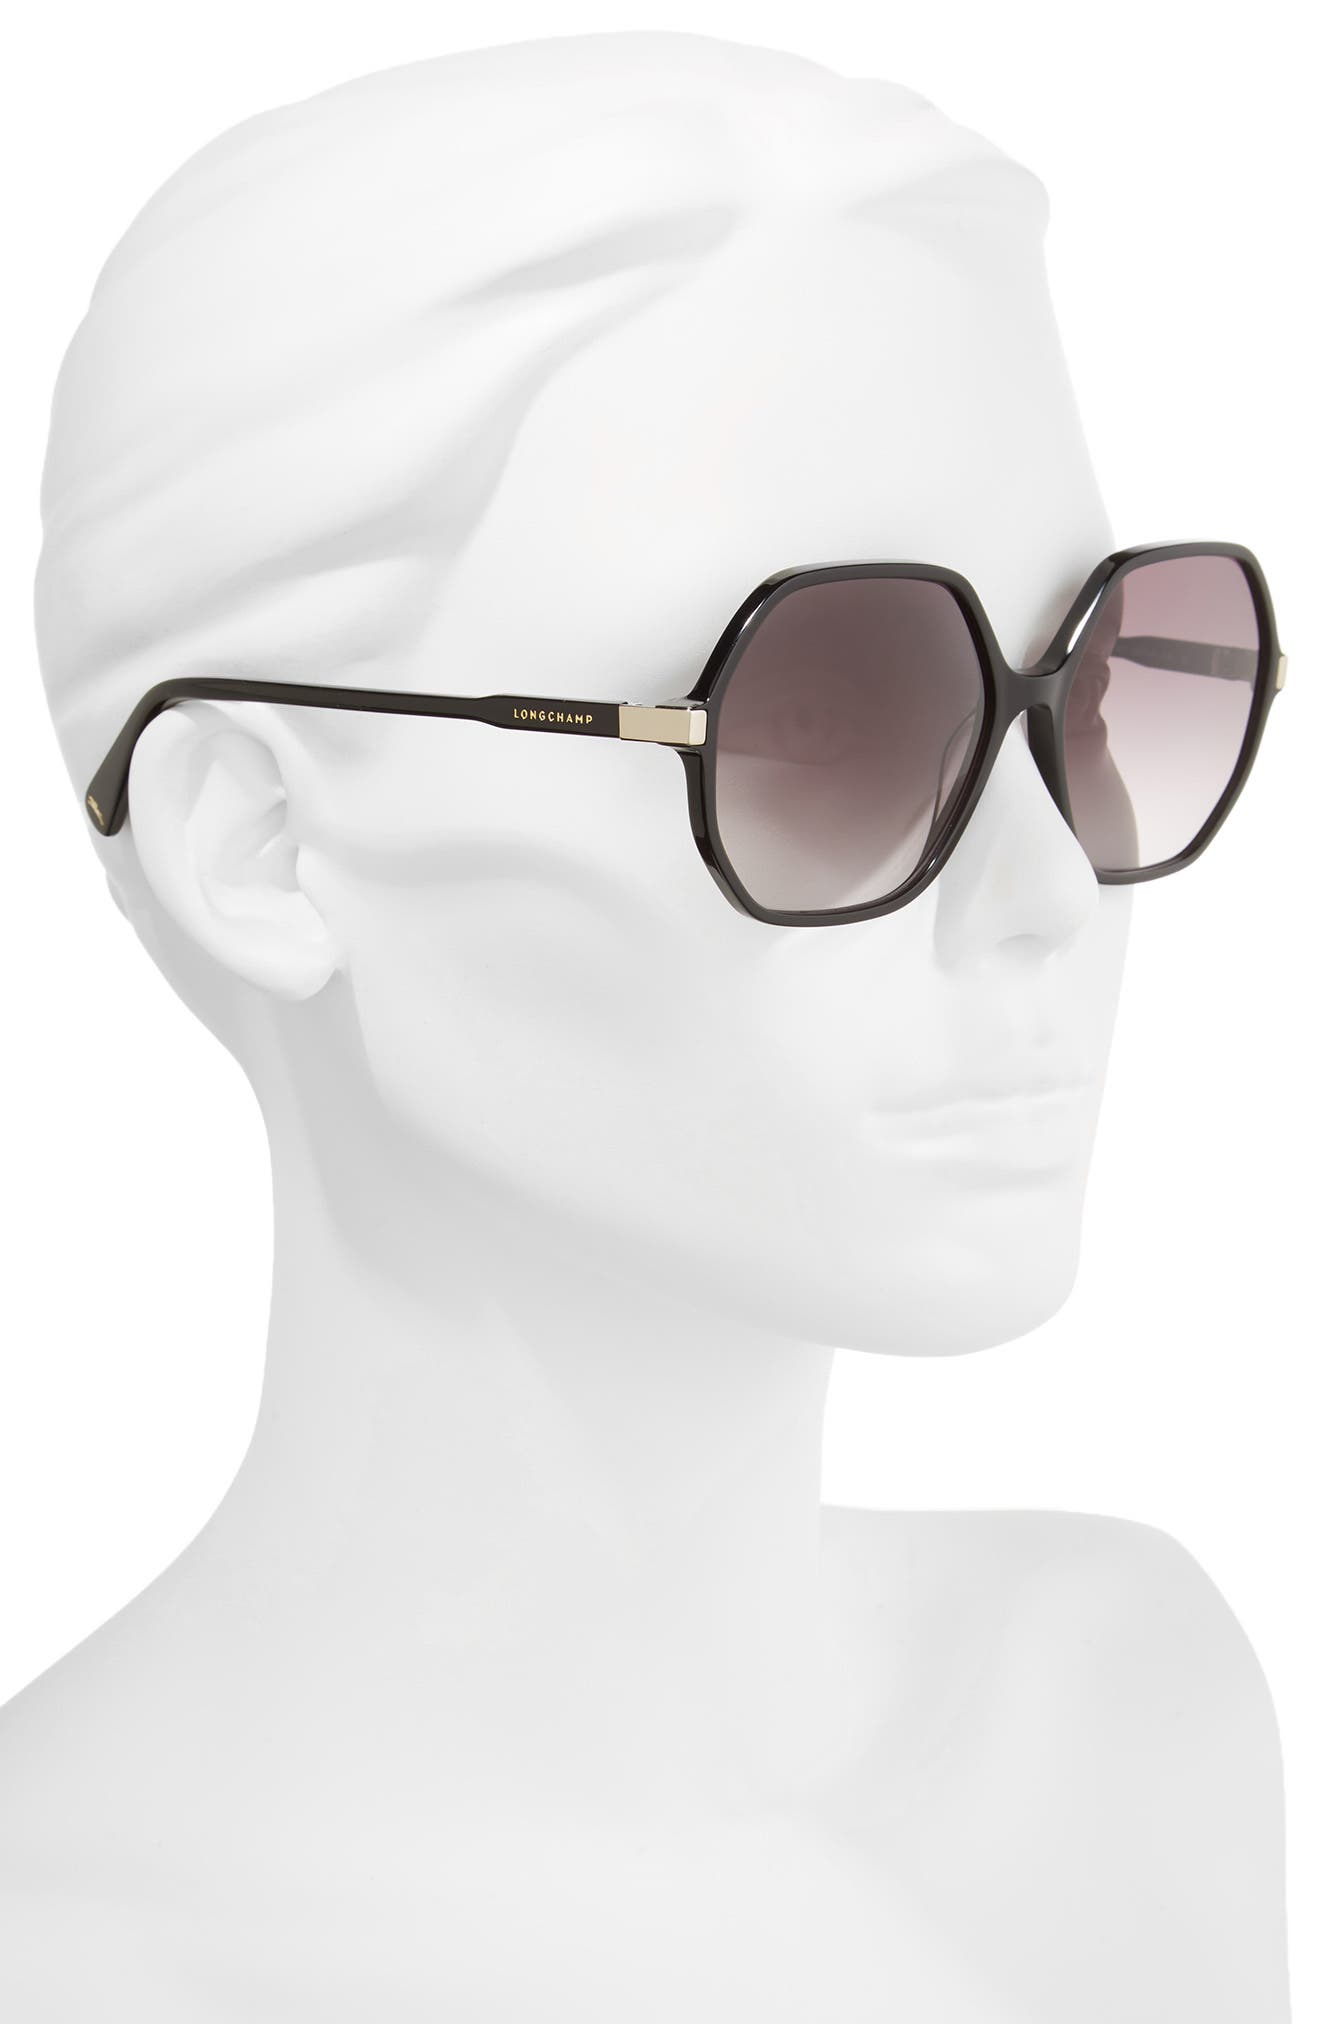 59mm Gradient Lens Hexagonal Sunglasses,                             Alternate thumbnail 2, color,                             BLACK